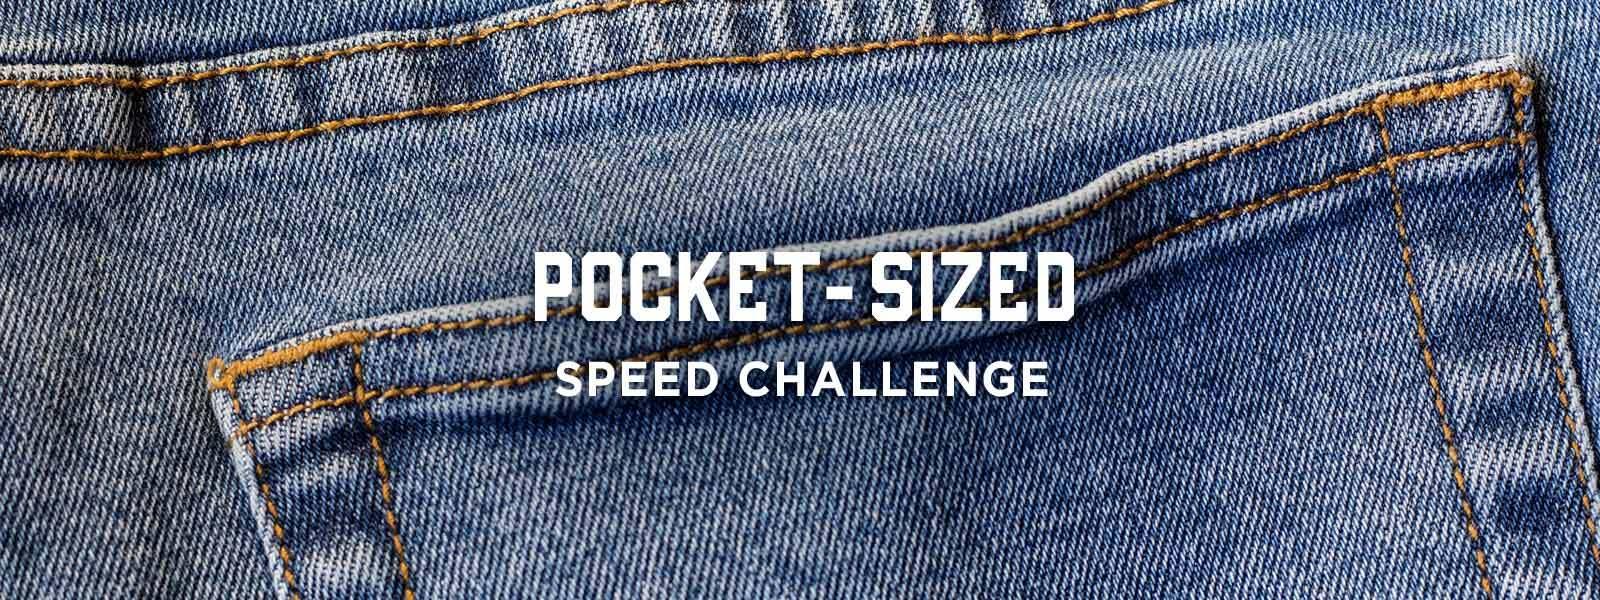 Pocket-Sized Speed Challenge